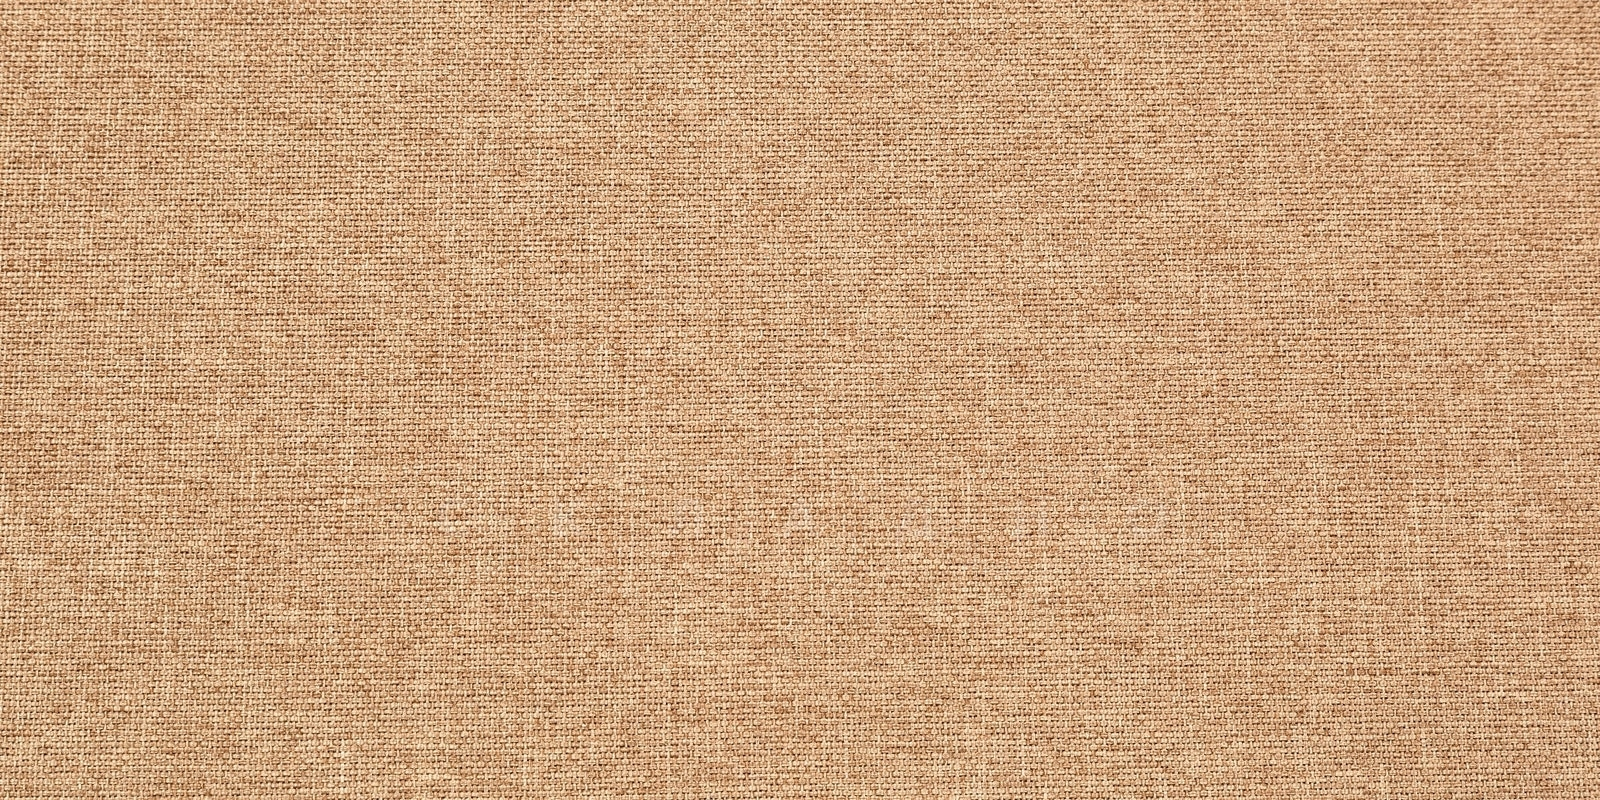 Диван Флэтфорд рогожка бежевый цвет фото 8 | интернет-магазин Складно